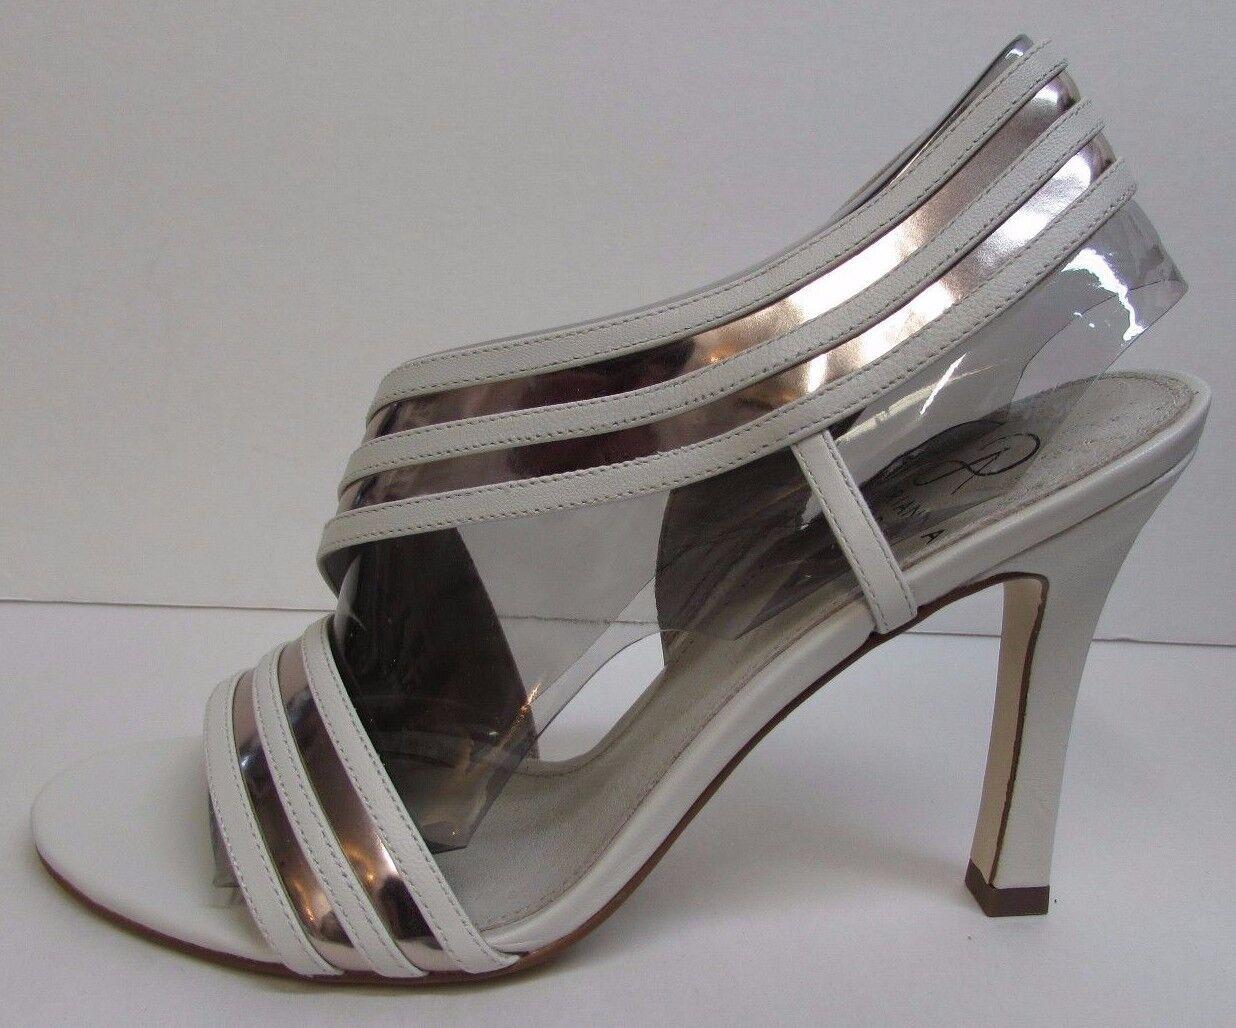 Adrianna Papell Size 8 Vanilla Bone Pelle Open Toe Heels New Donna Shoes